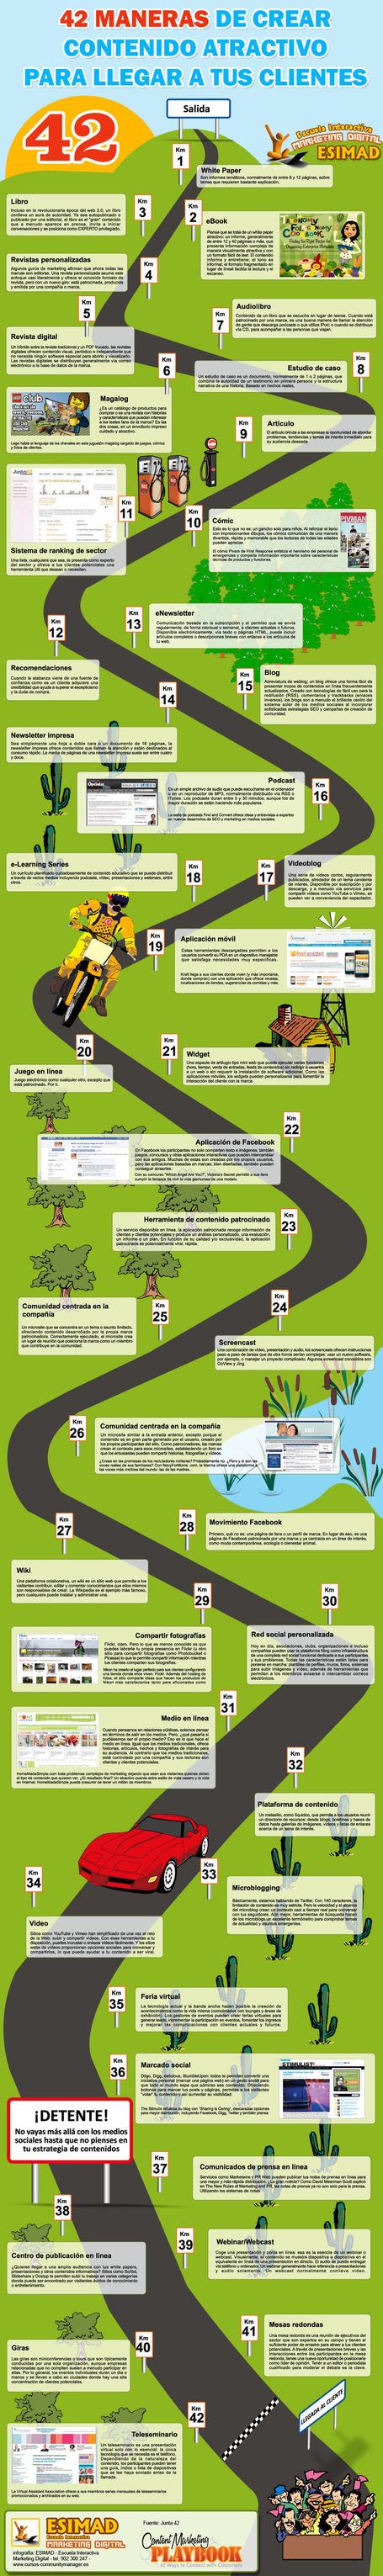 42 maneras de crear contenido atractivo #infografia#infographic#socialmedia | infografiando | Scoop.it